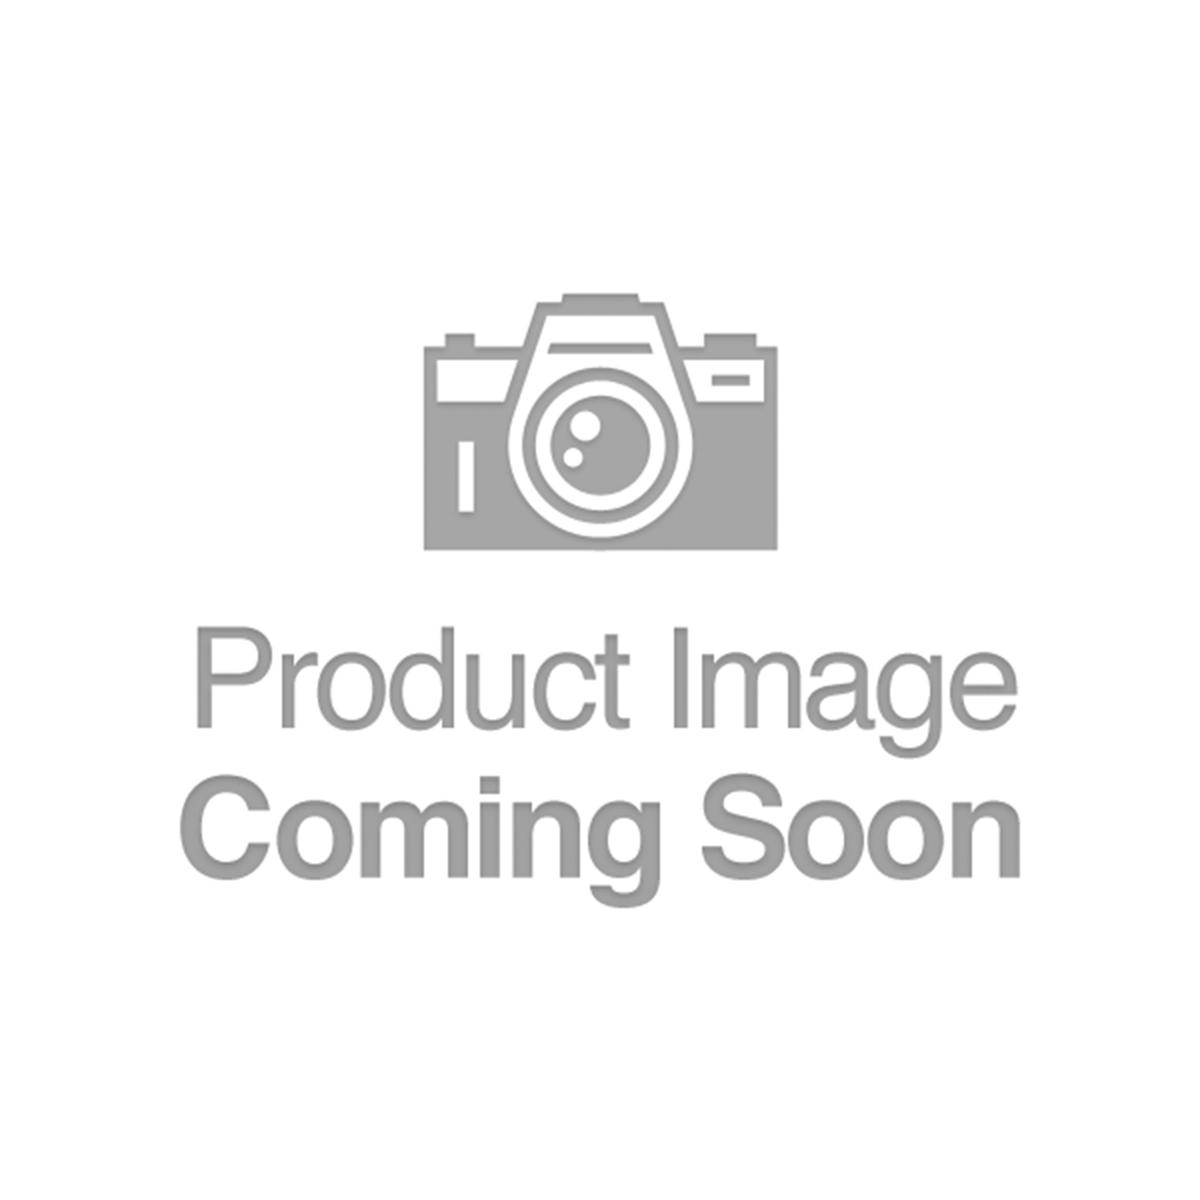 FR 272 $5 1899 Silver Certificate PMG 64 EPQ